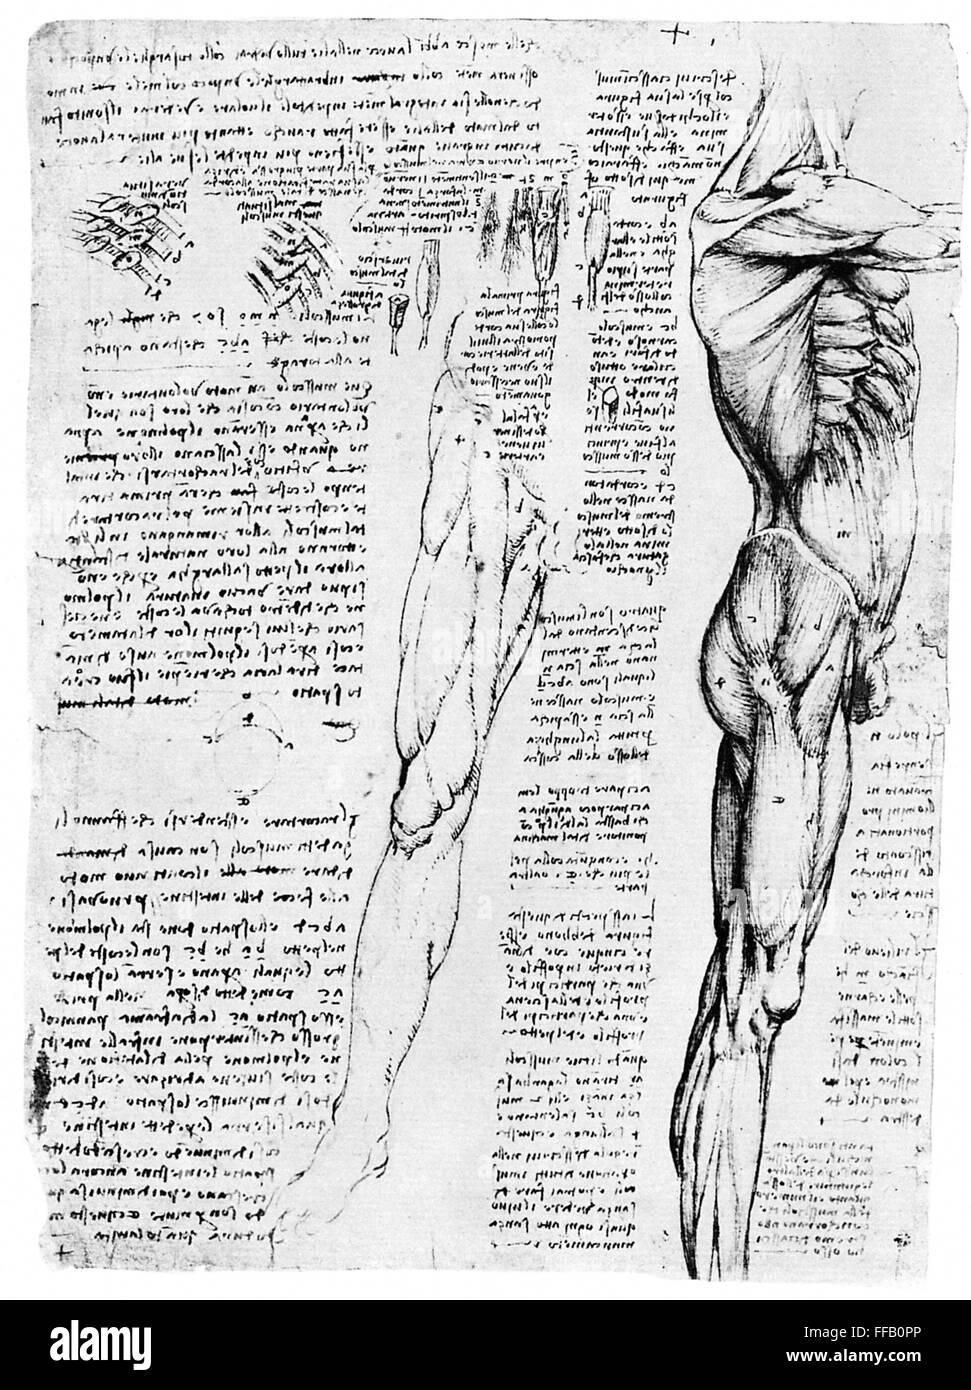 Großzügig Anatomie Leonardo Da Vinci Galerie - Anatomie Ideen ...